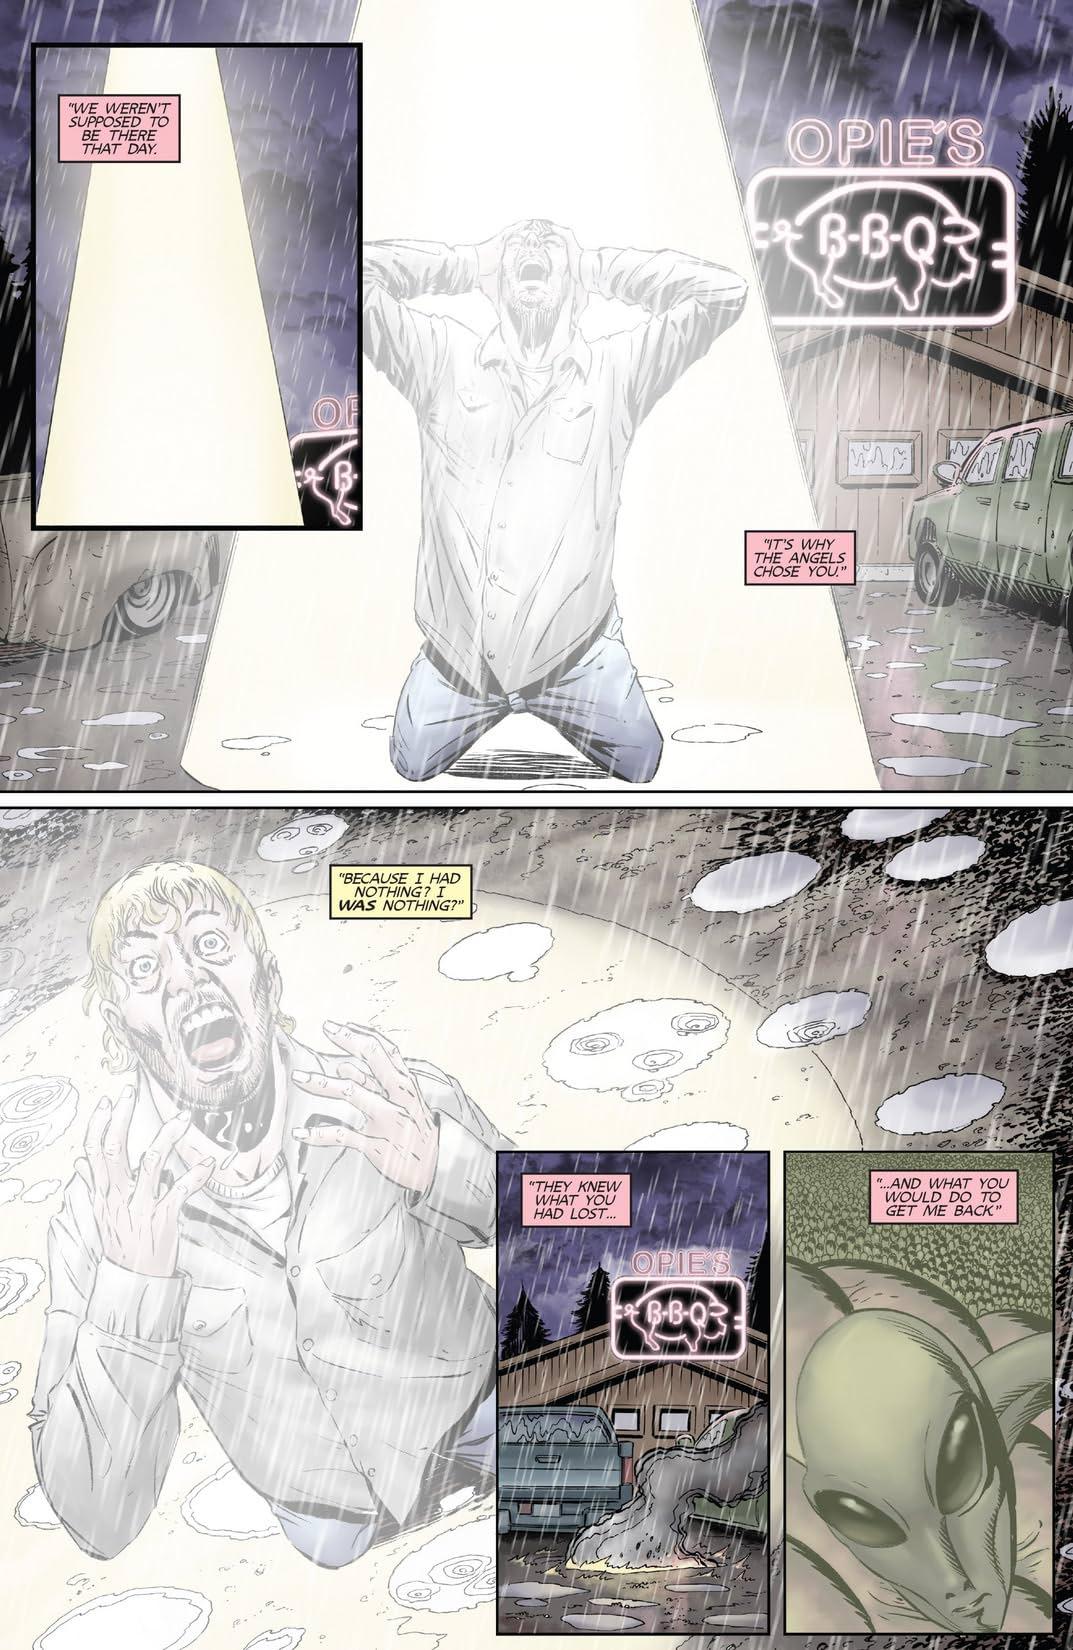 Cryptozoic Man #4 (of 4): Digital Exclusive Edition